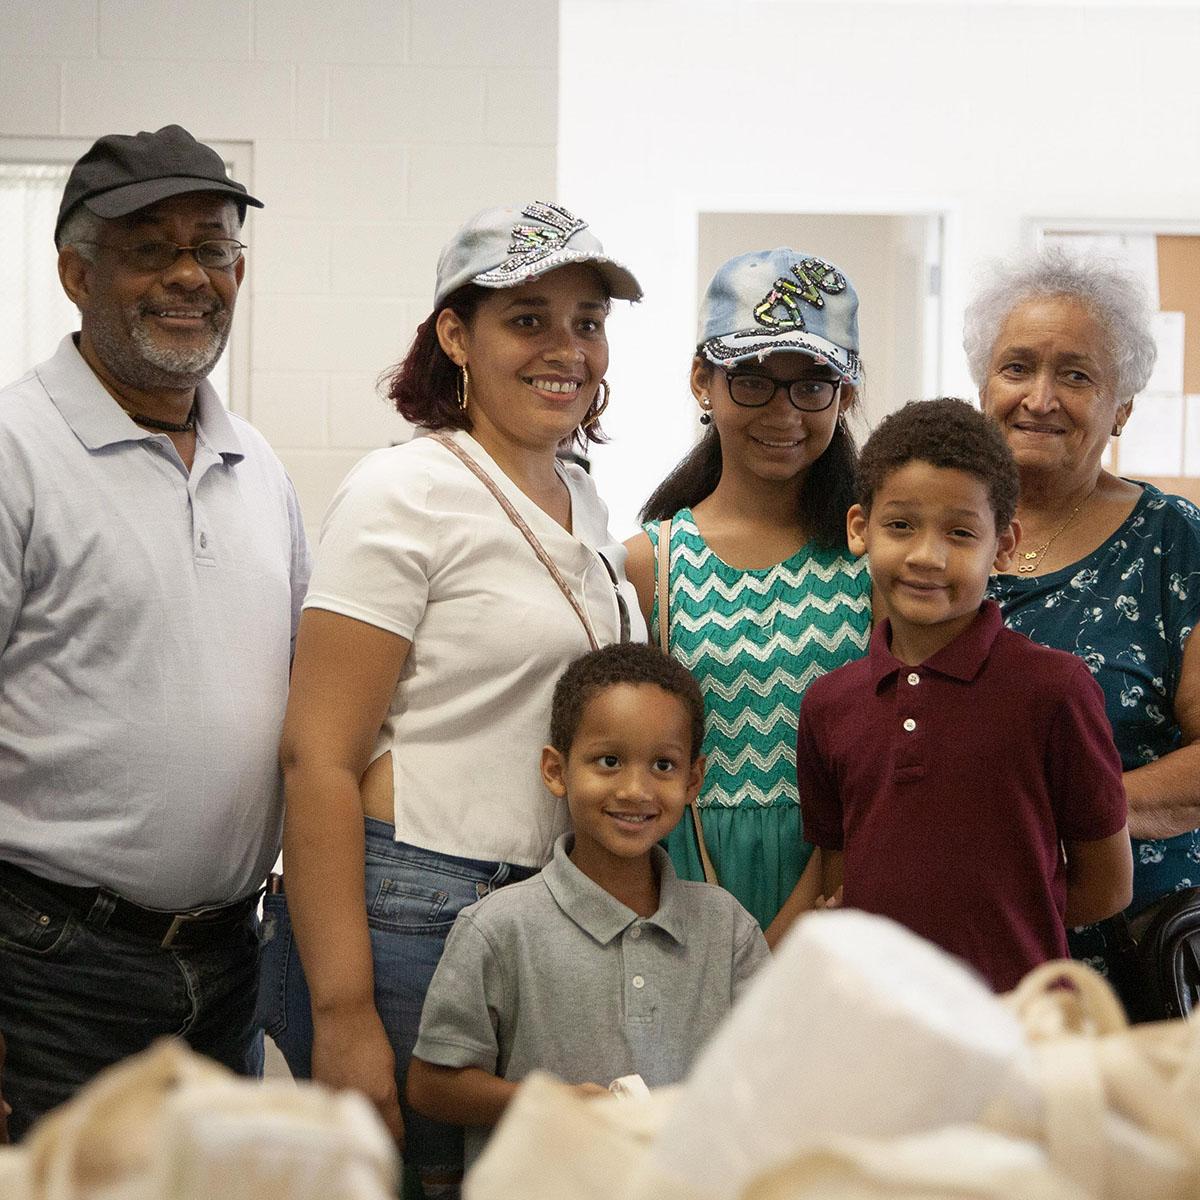 Claudia Ramos de Rivera brought the whole family!